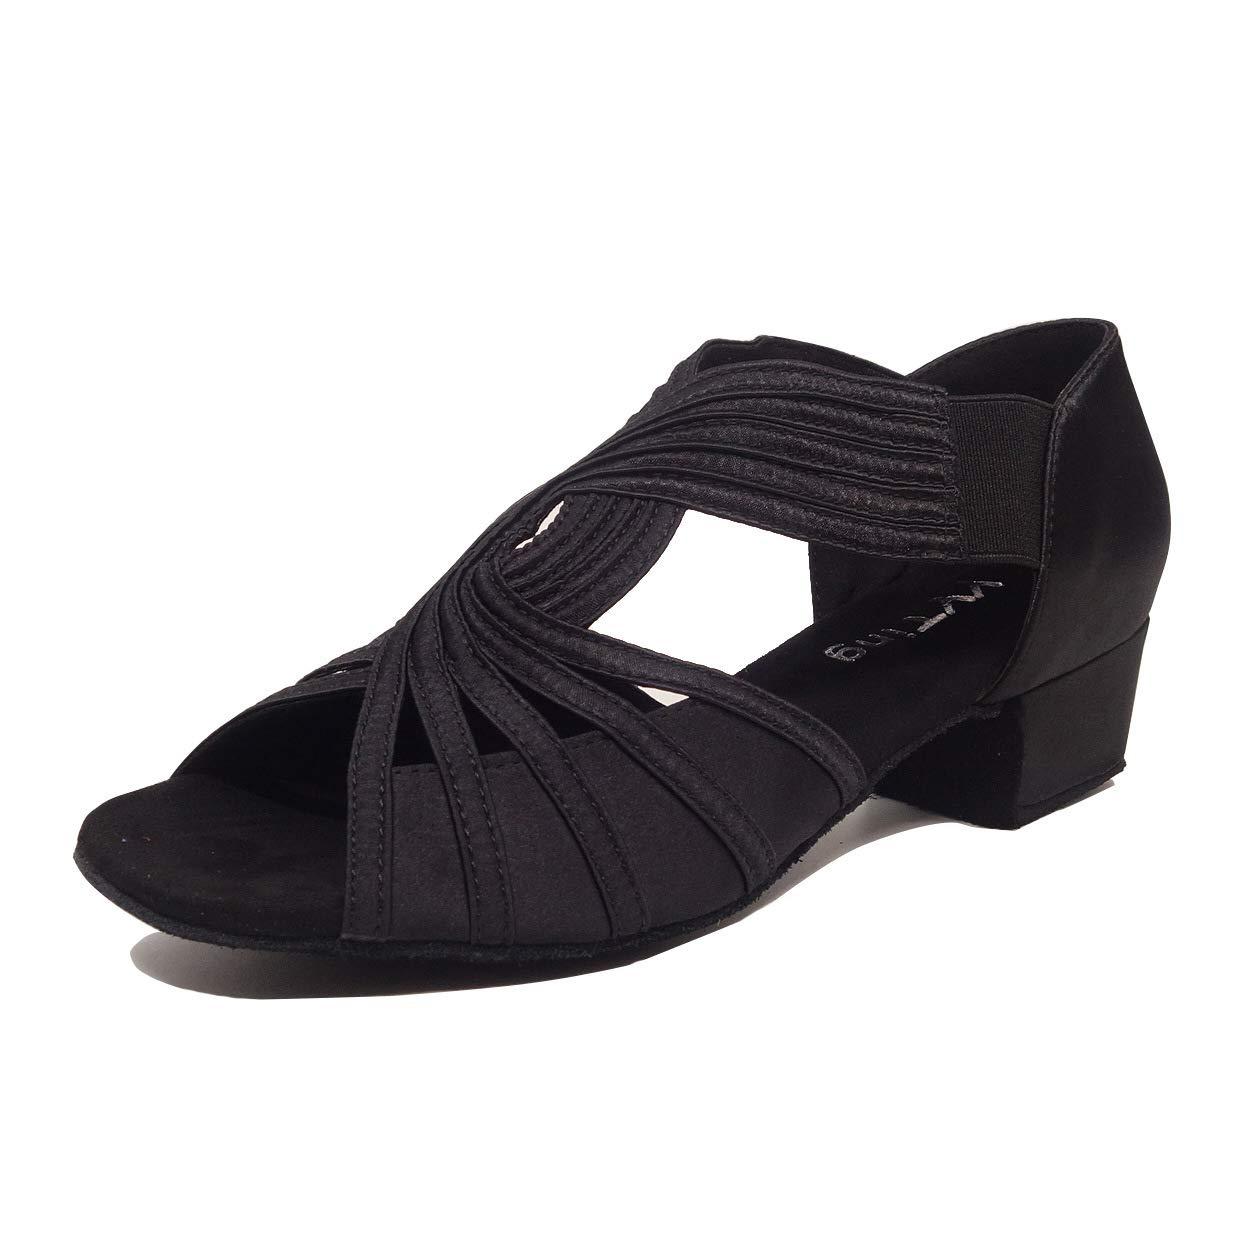 Low Heel Women Ballroom Dance Shoes Salsa Batchata Social Beginner Practice Wedding Dancing 2'' Heels YT04(9, Black) by YYTing